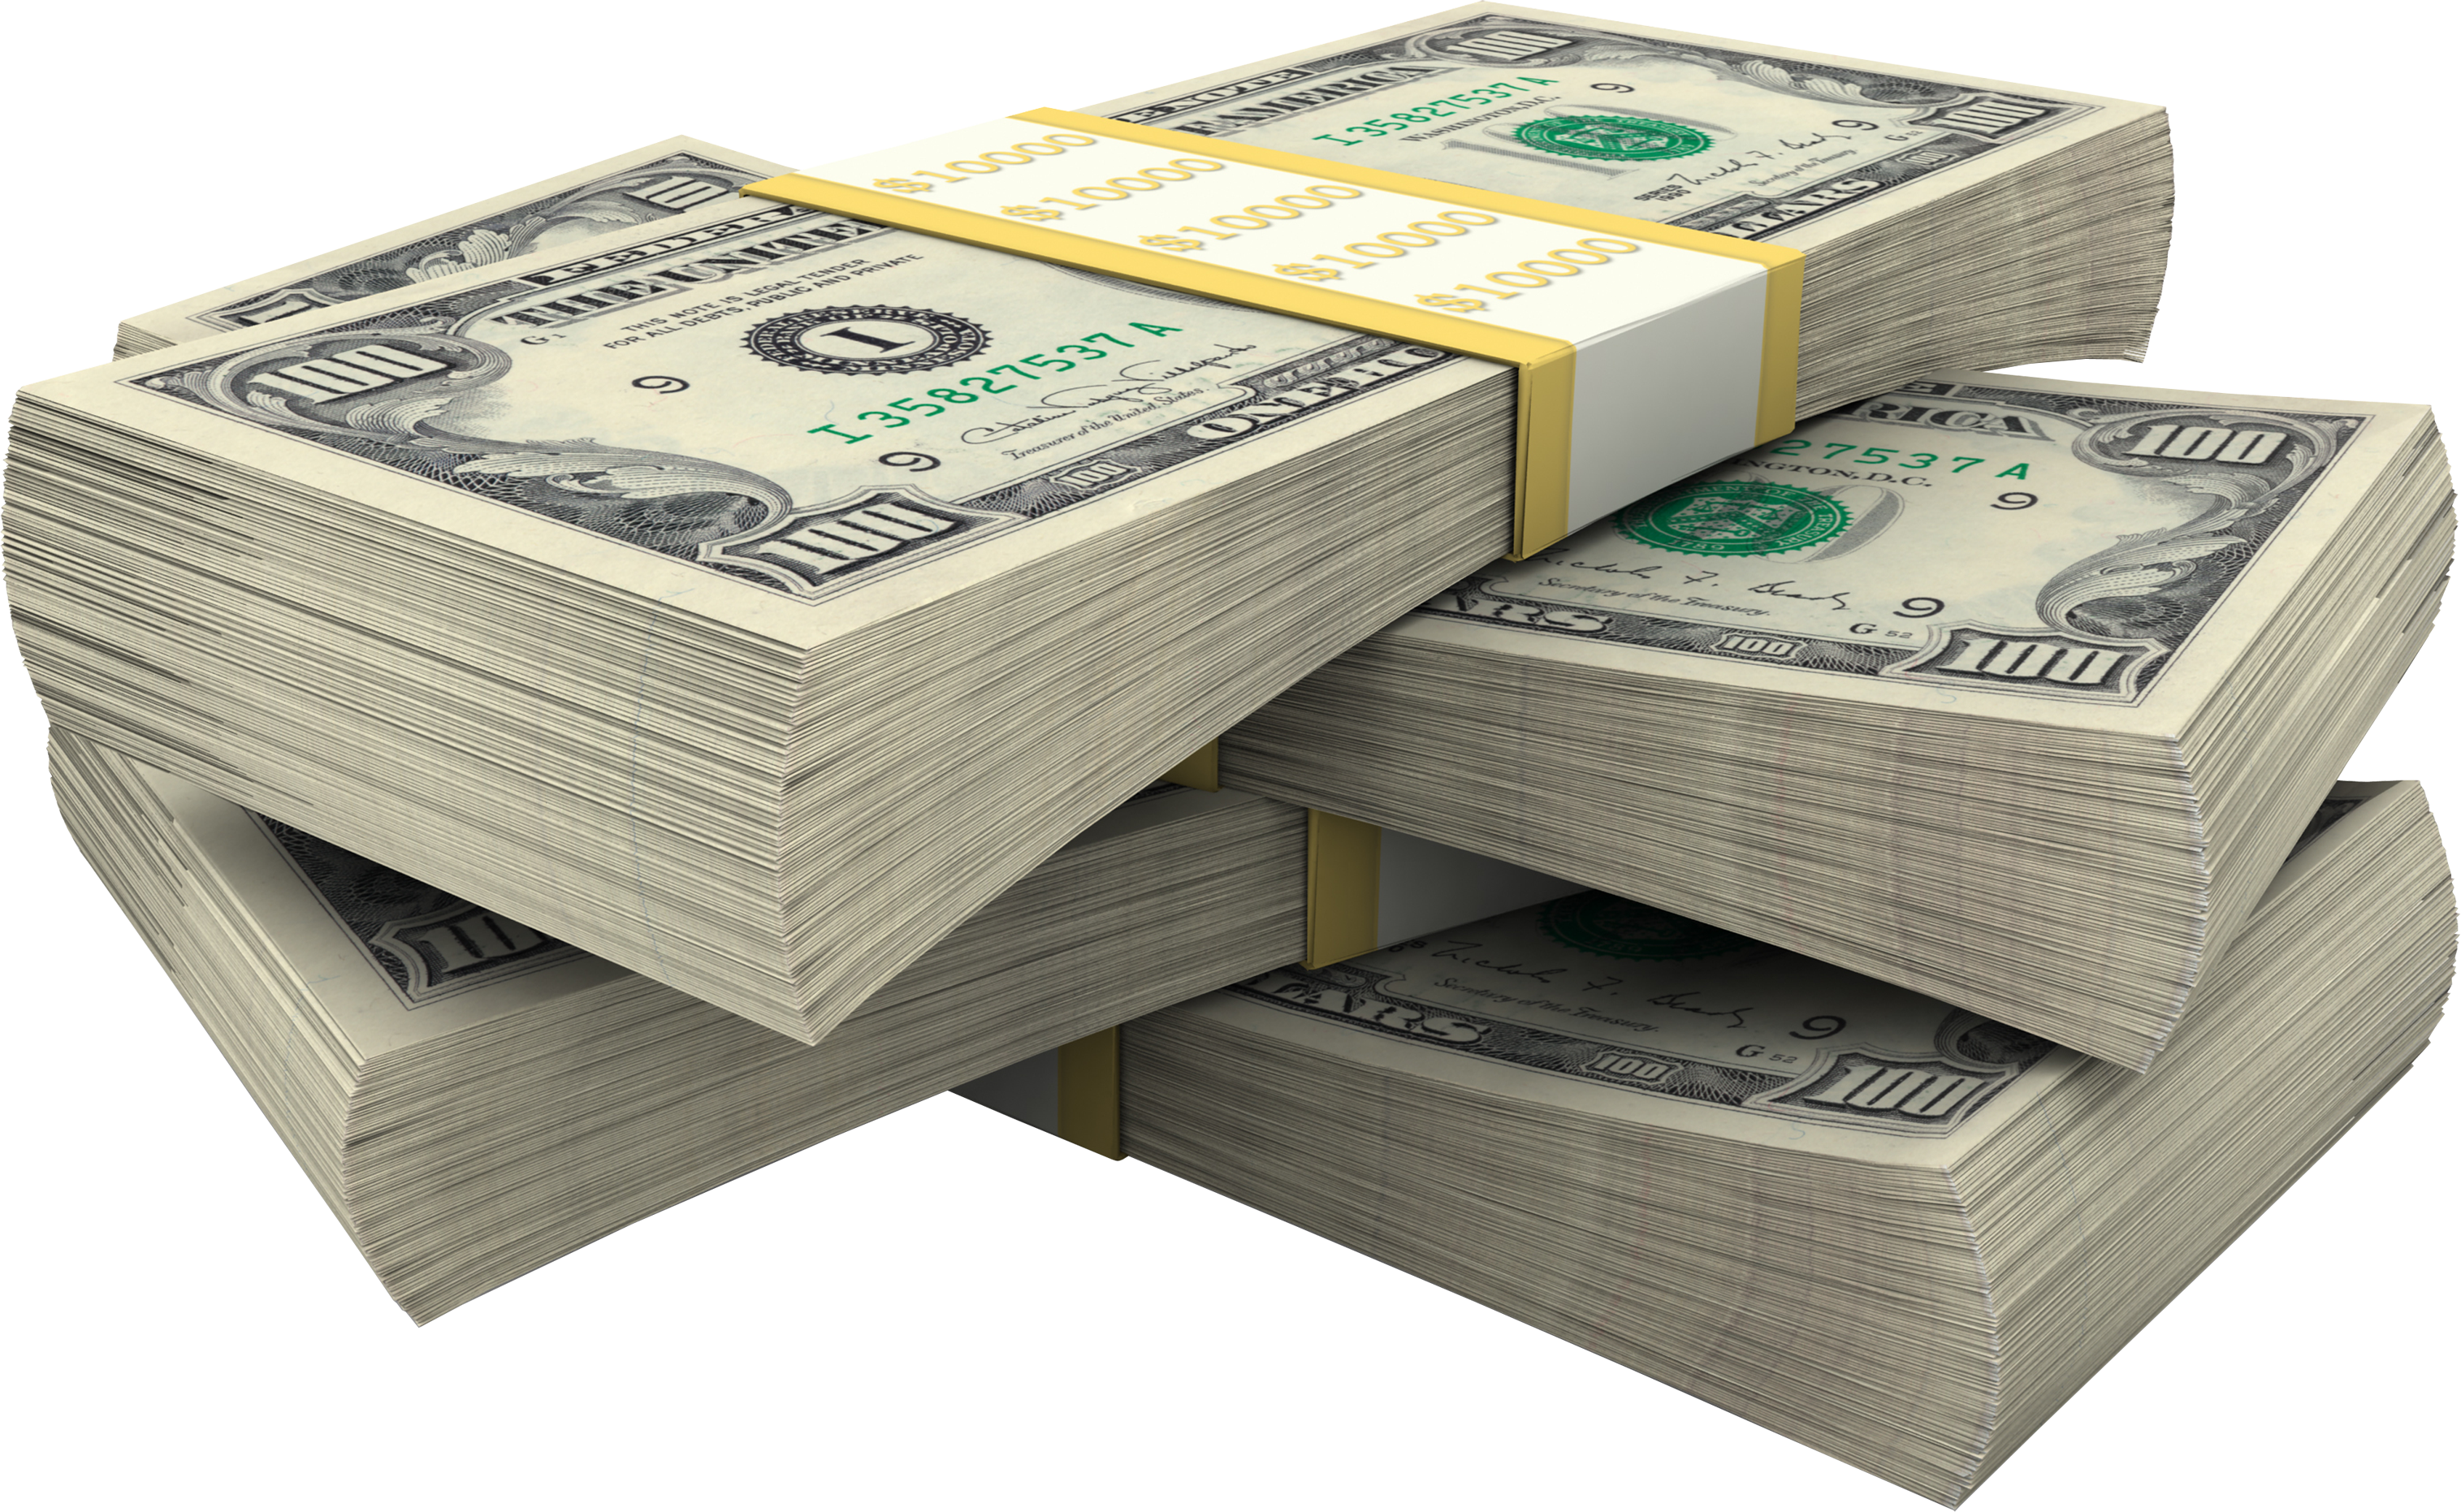 Hd money clipart - PNG HD Money